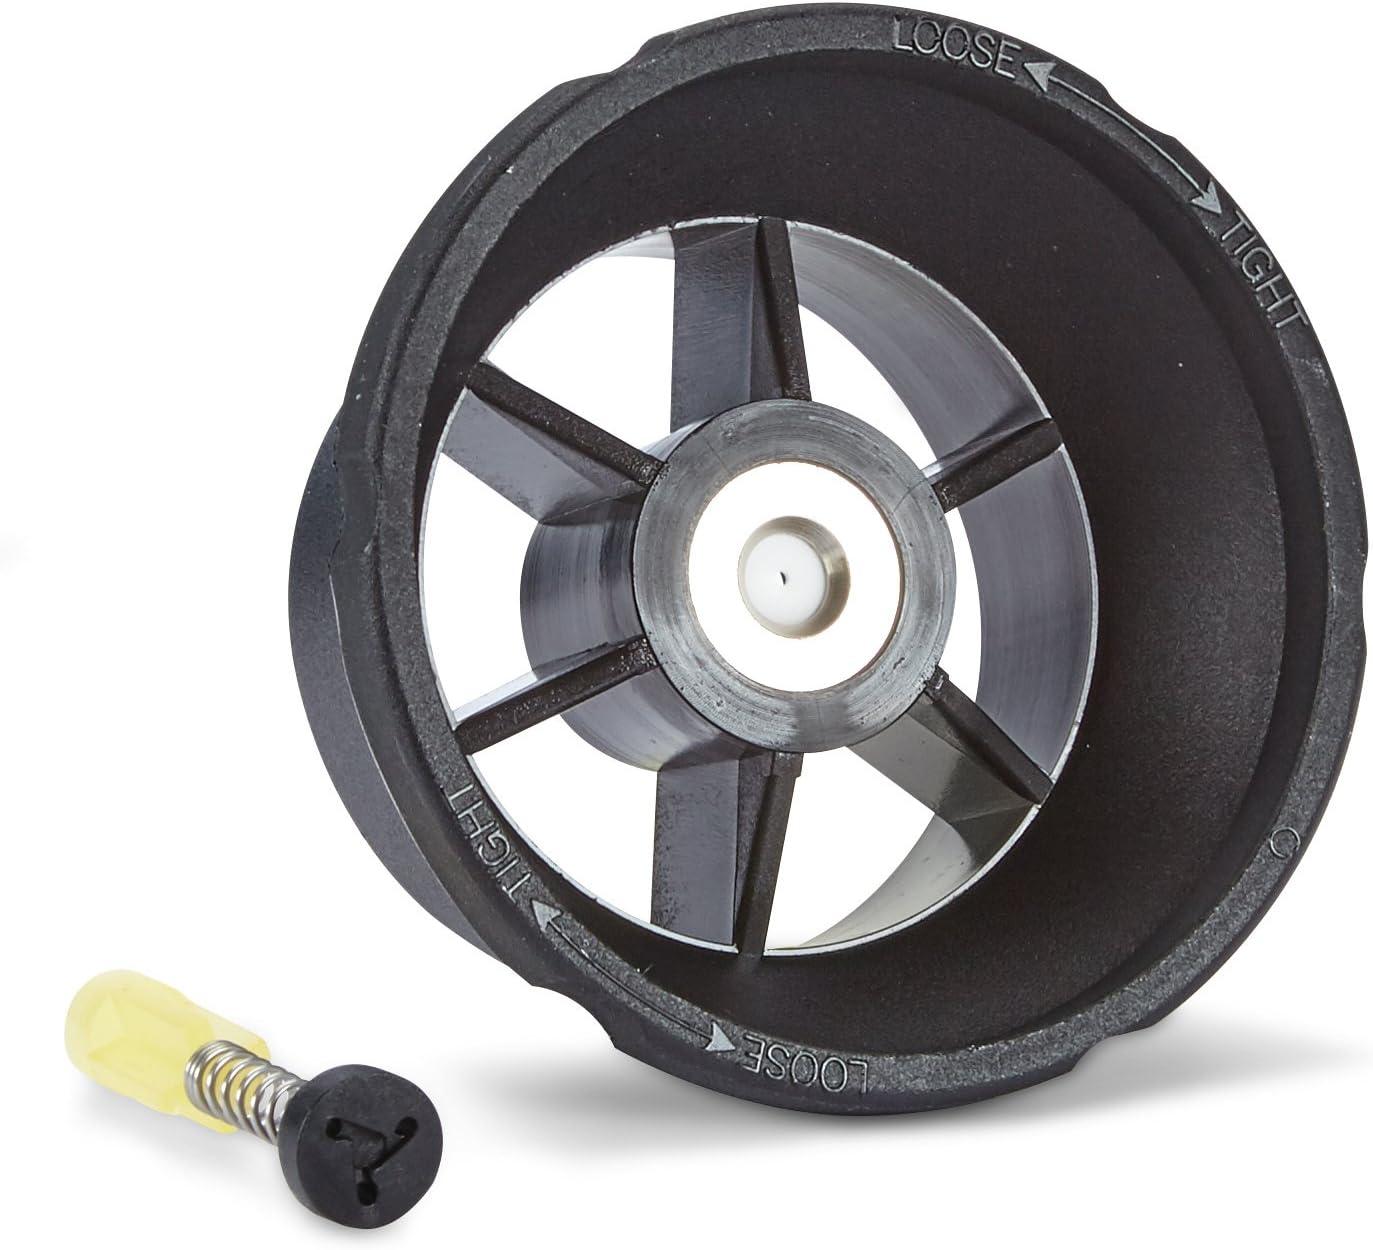 HomeRight C800955 Spray Tip, Cone Paint Sprayers 0.8MM, Multi